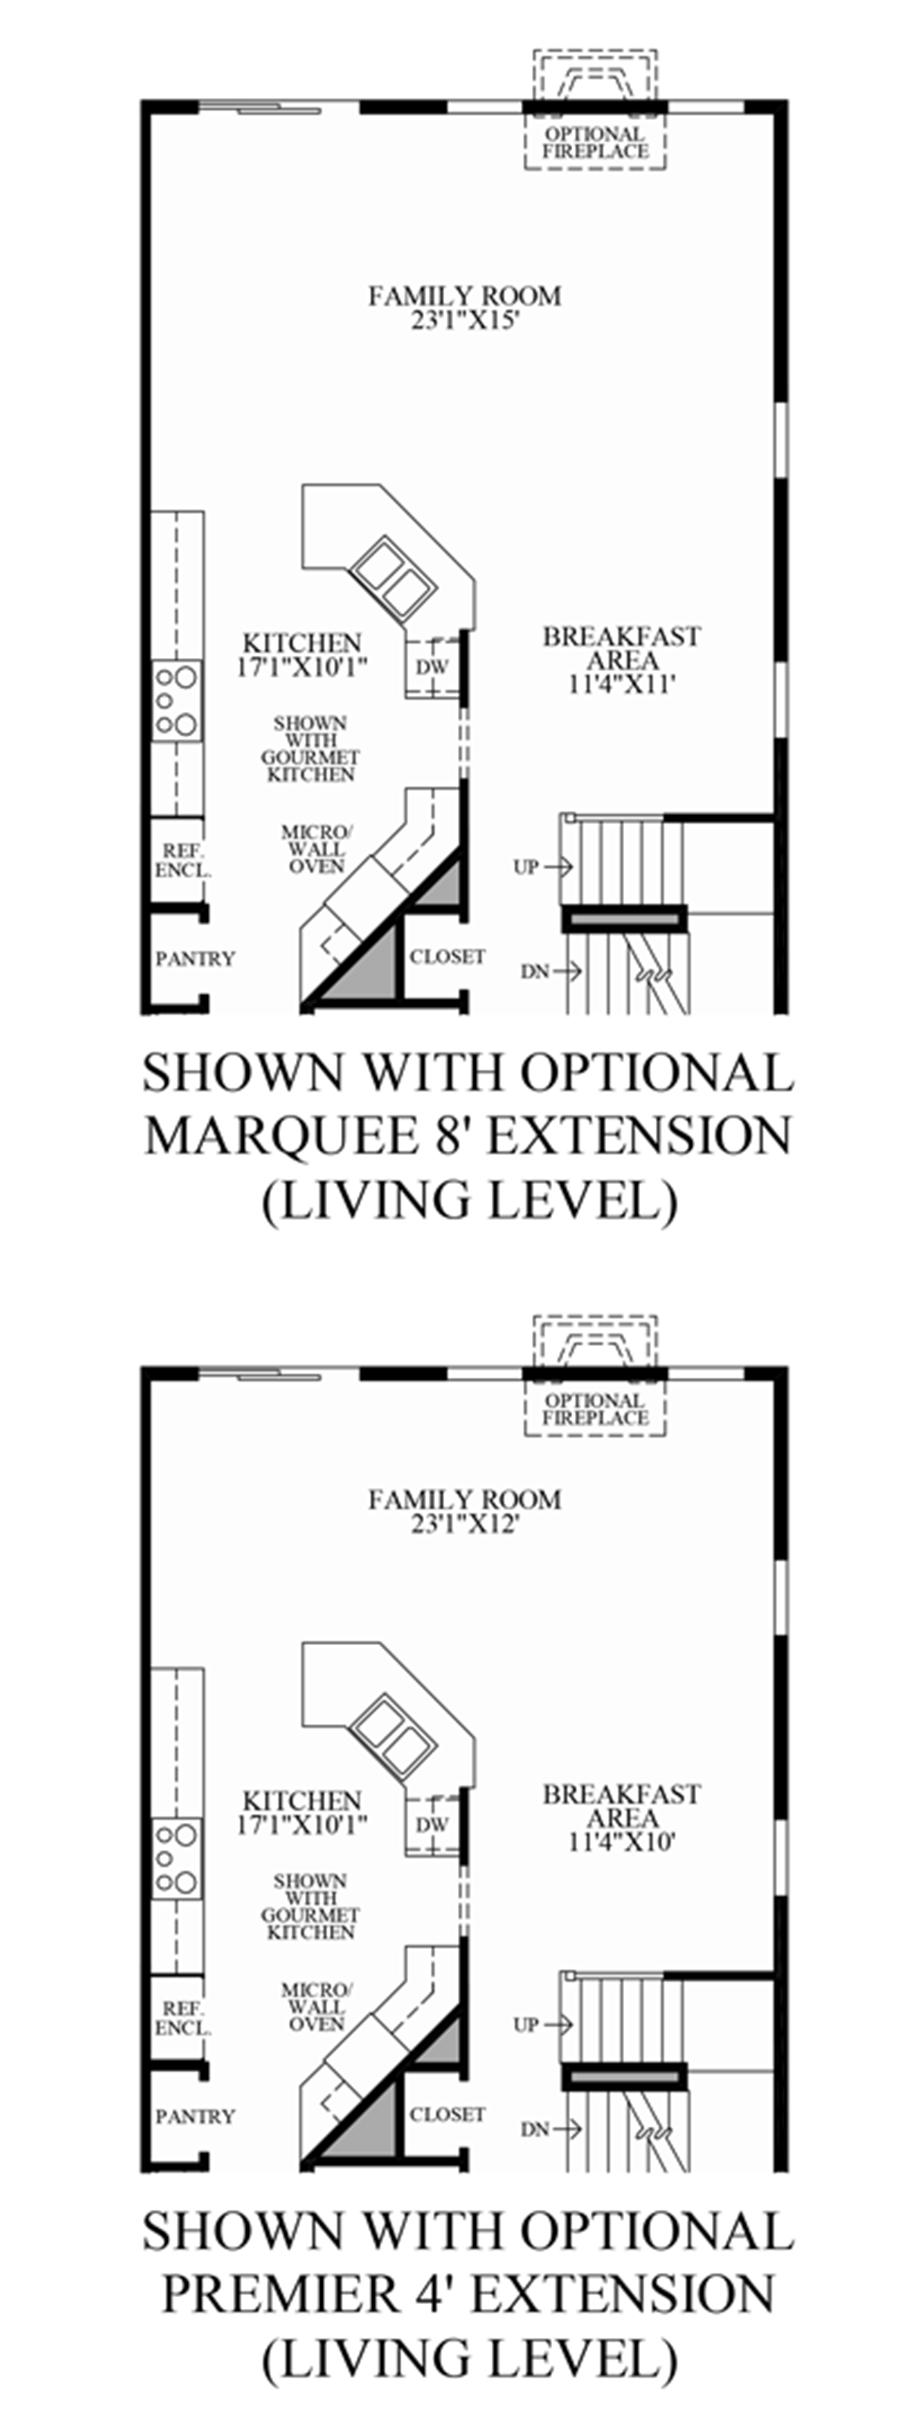 Optional Living Level Extensions Floor Plan